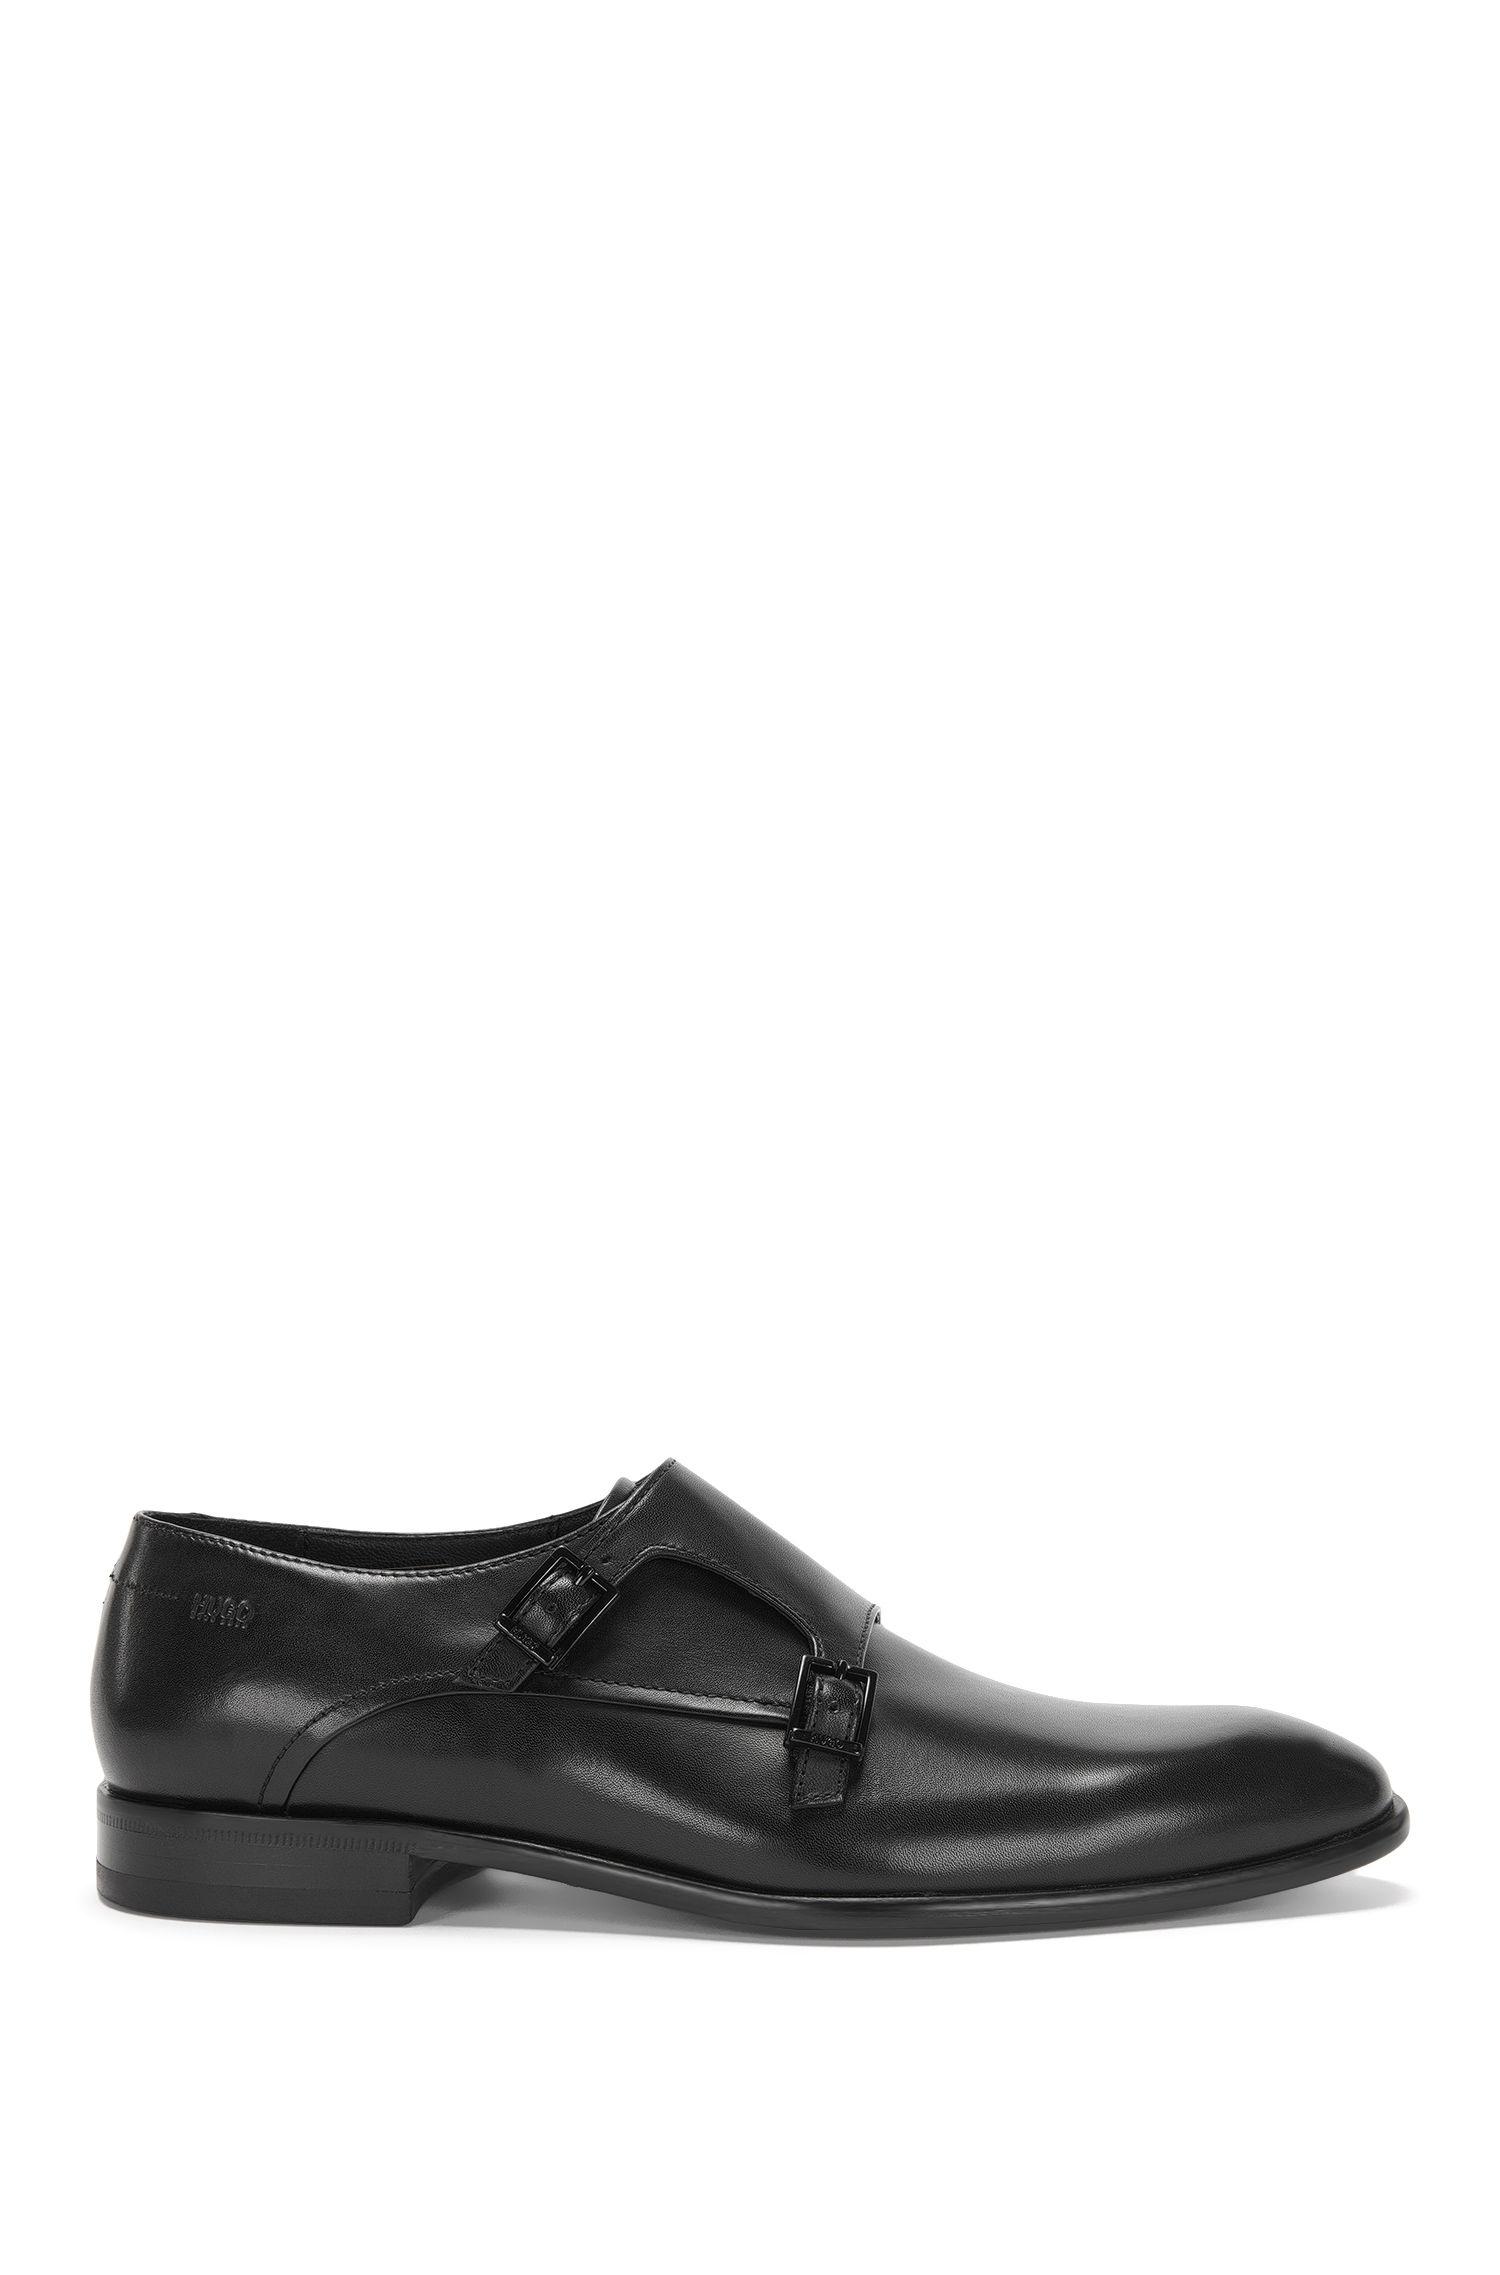 'Dressapp Monk Bu'   Calfskin Double Monk Strap Dress Shoes